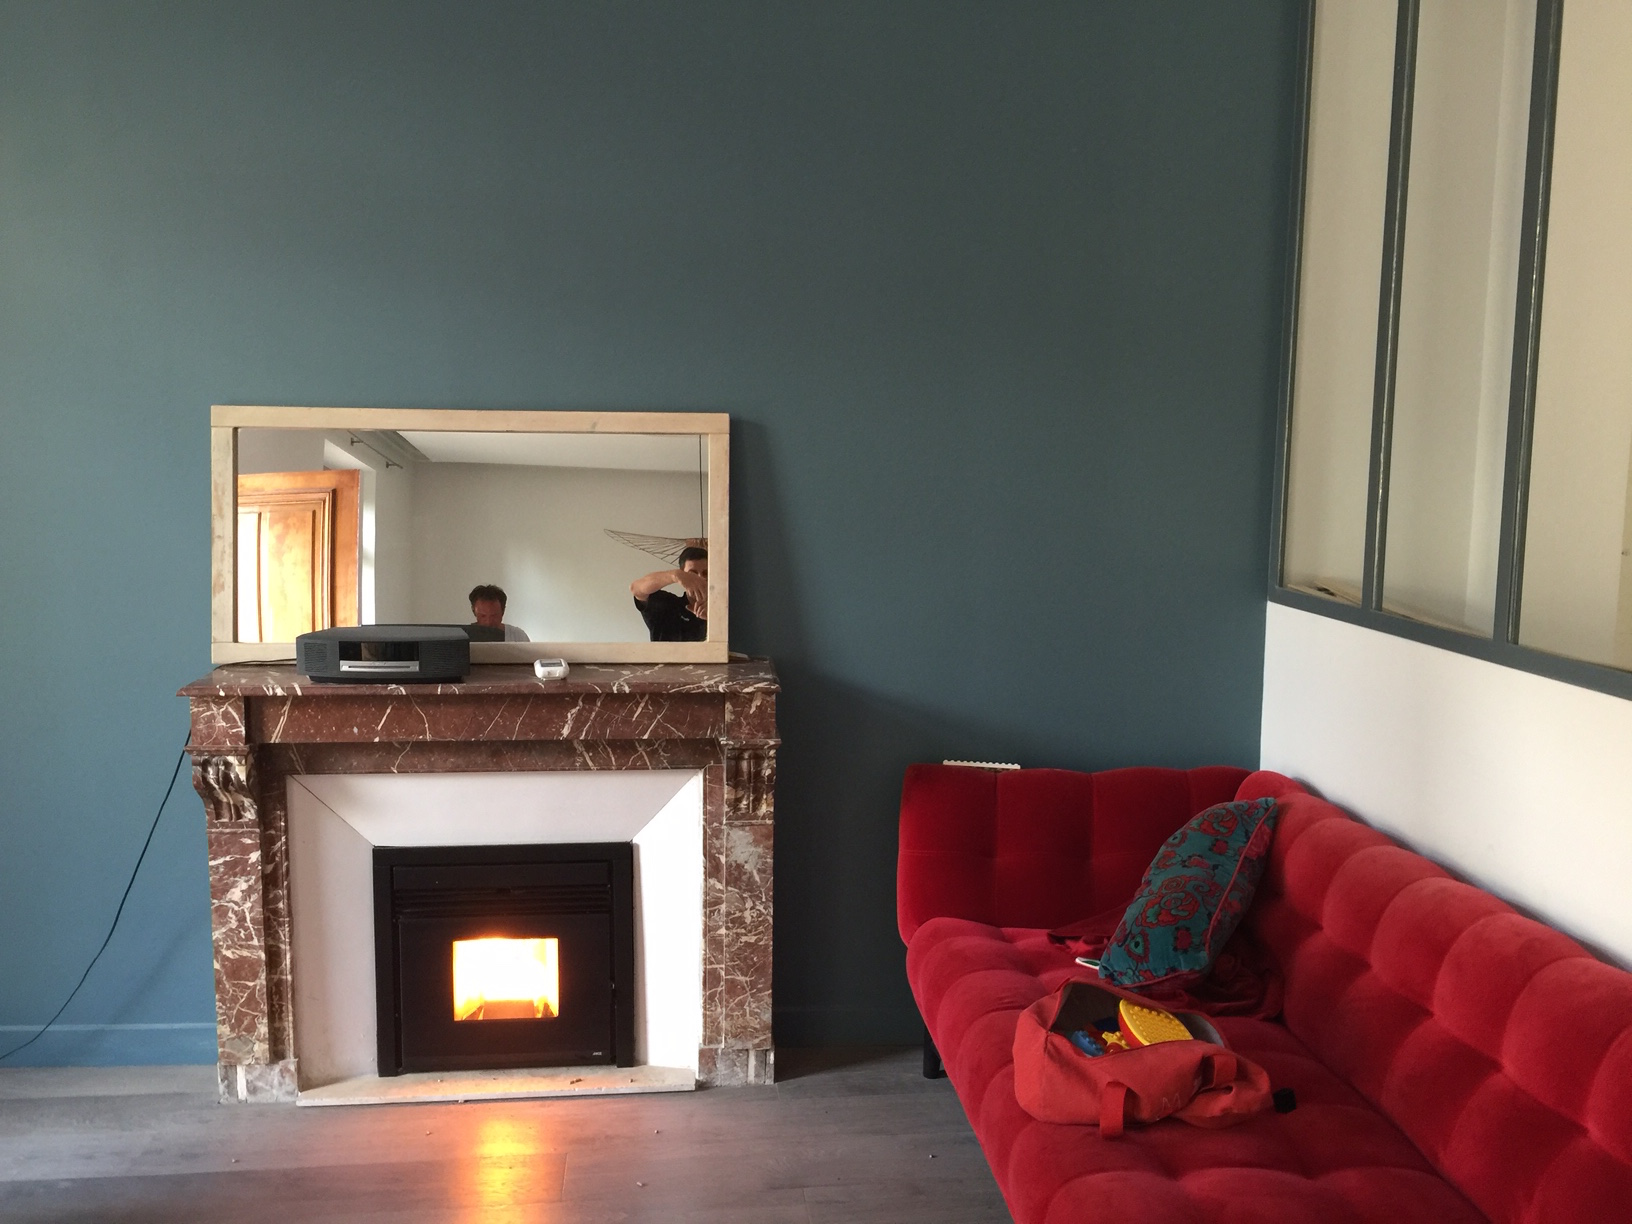 pose d 39 un insert granul s boxtherm 60 toulon. Black Bedroom Furniture Sets. Home Design Ideas